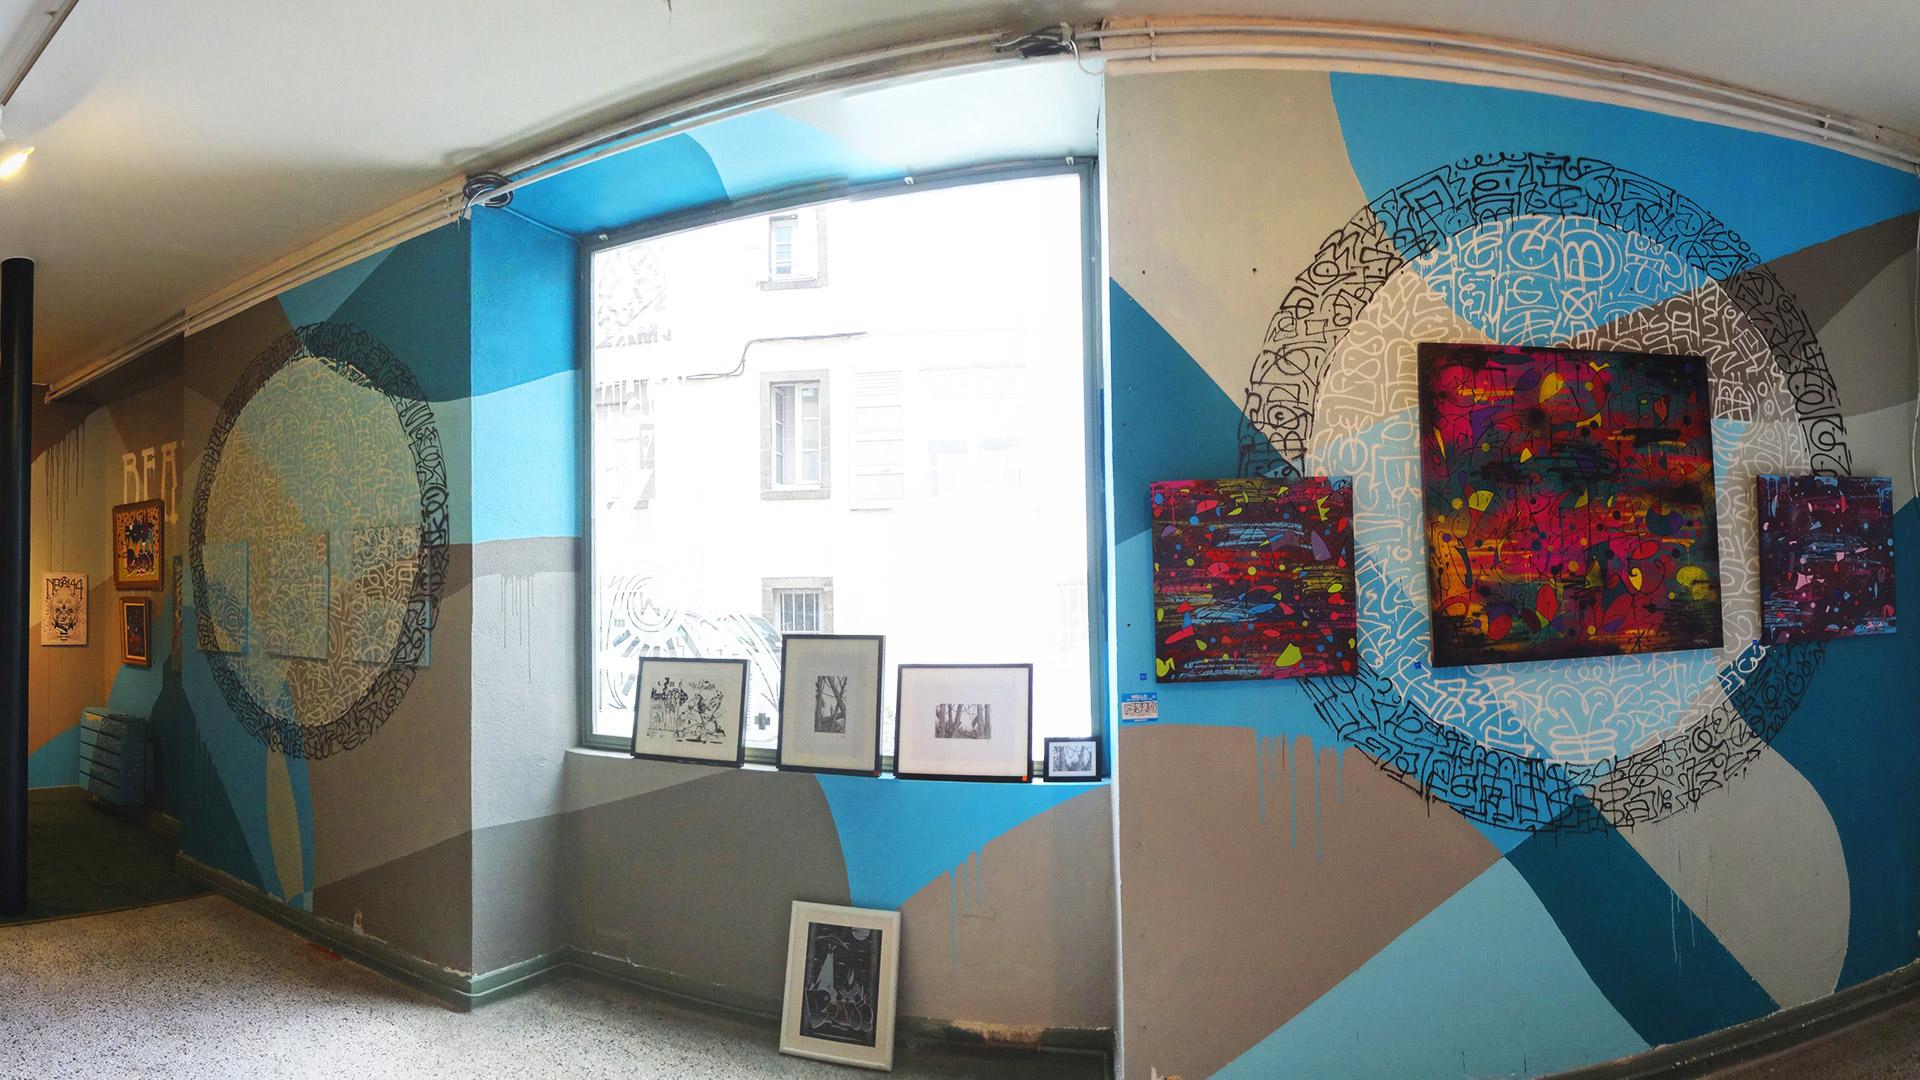 Beame 414 Exposition ENDtoEND - Street-Art - Rue Savaron Clermont-Ferrand